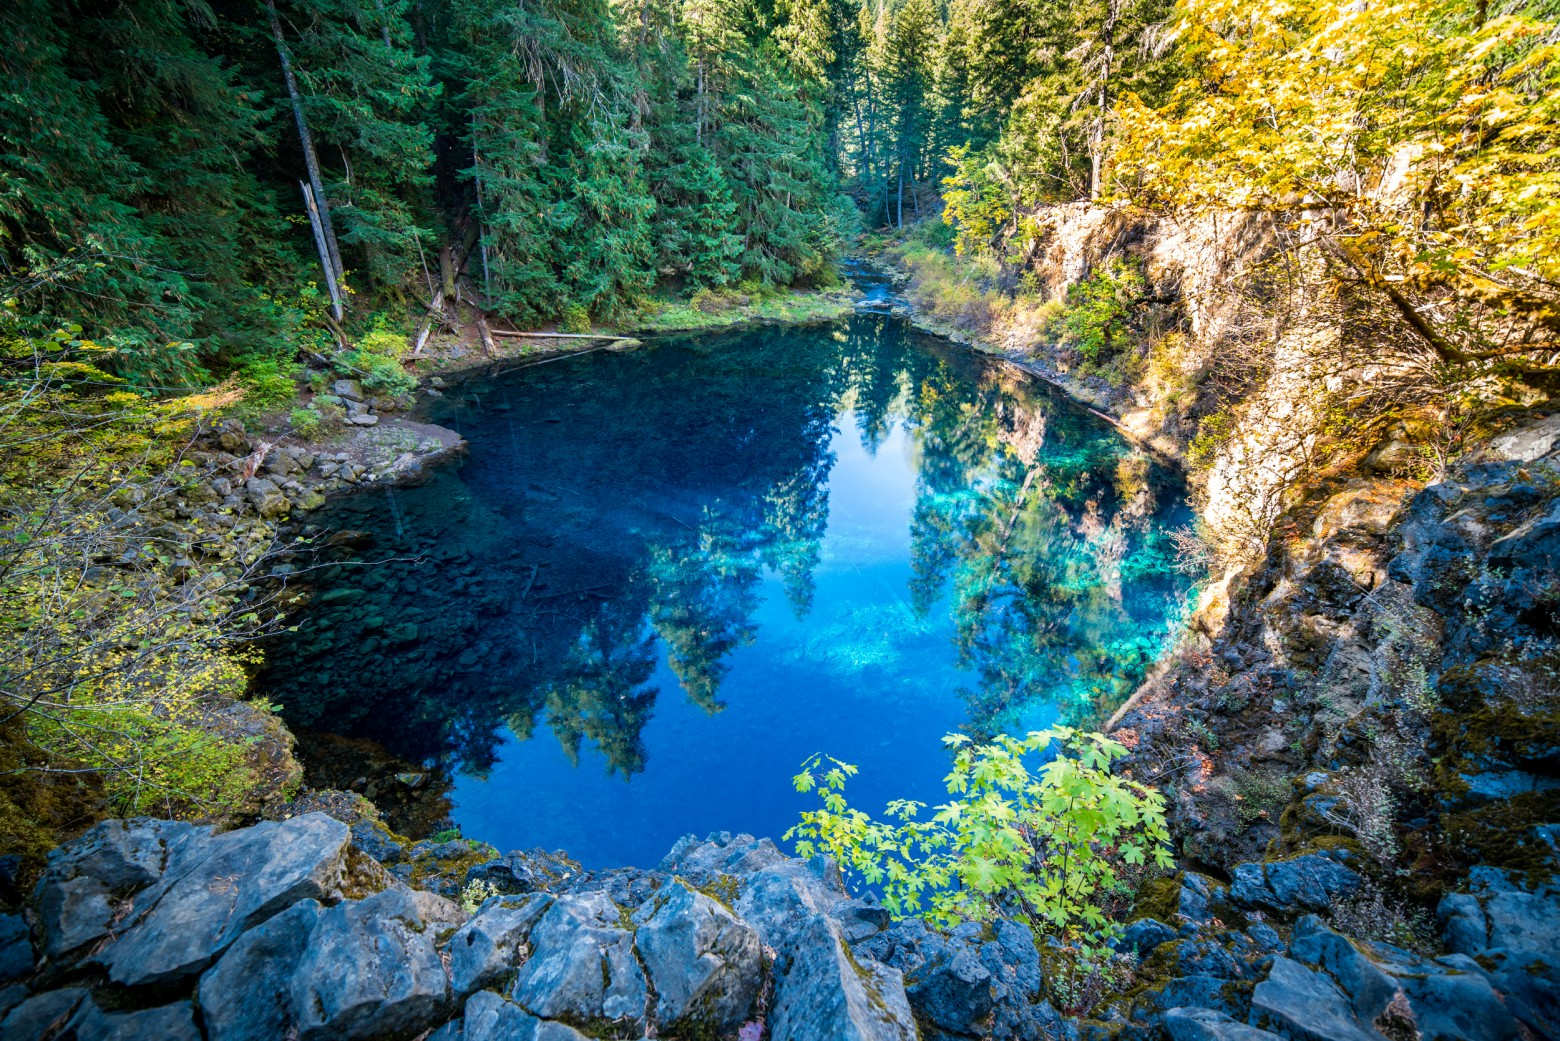 Blue Pool Mckenzie River Oregon